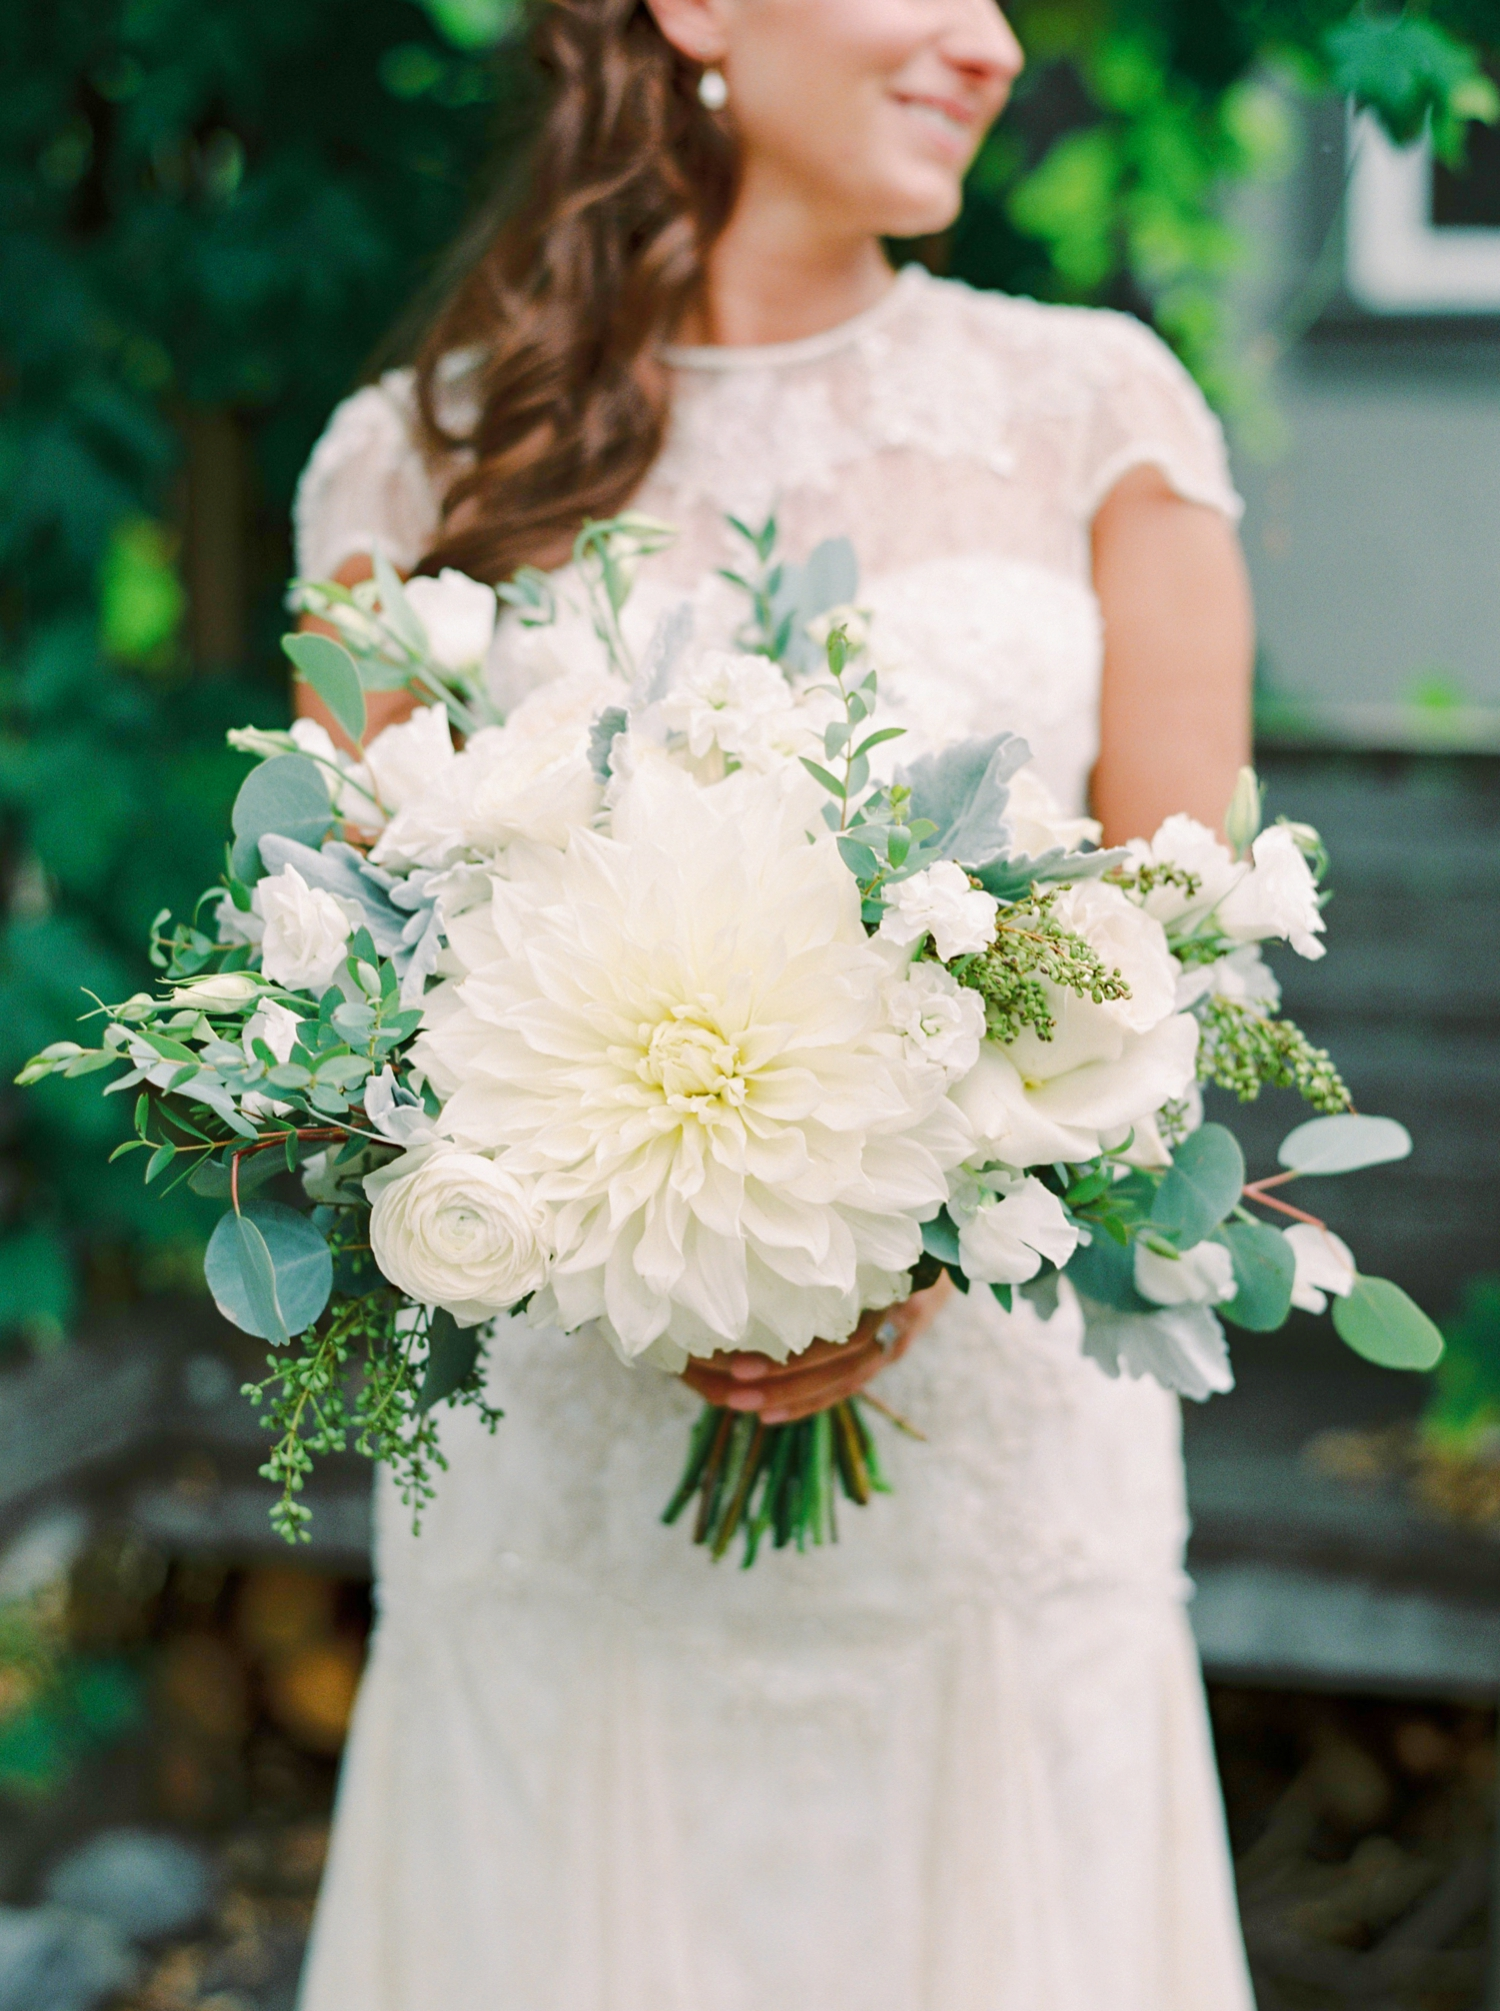 Calgary wedding photographers | fine art film | Justine Milton Photography | wedding inspiration | wedding dress | bouquet